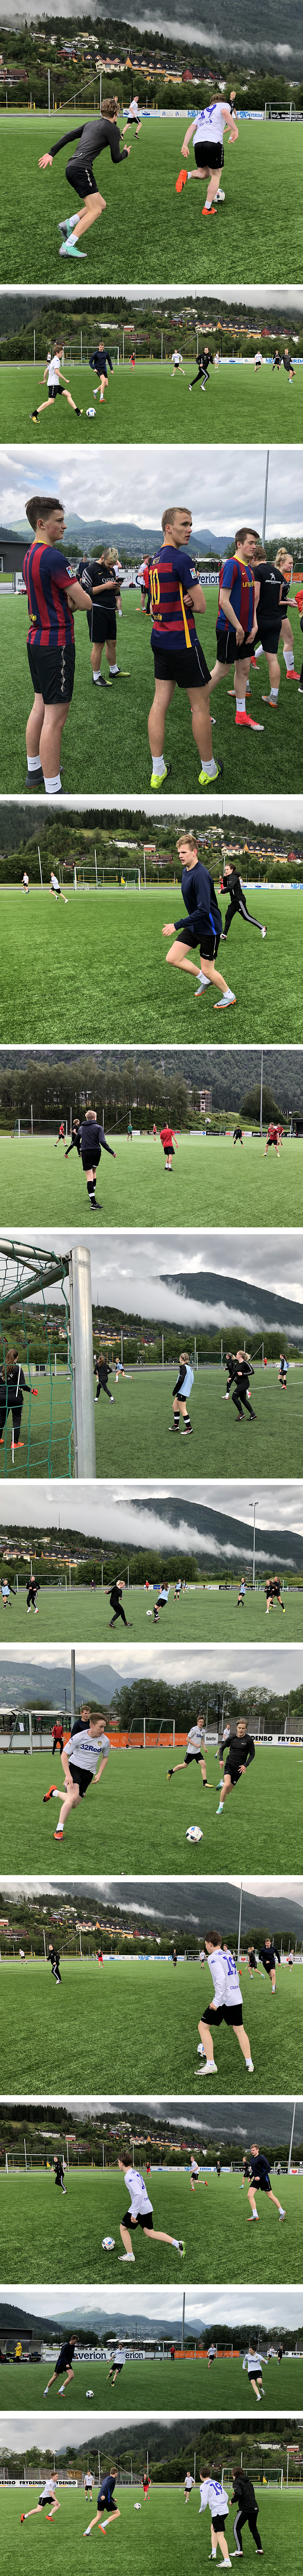 02 Fotball.jpg